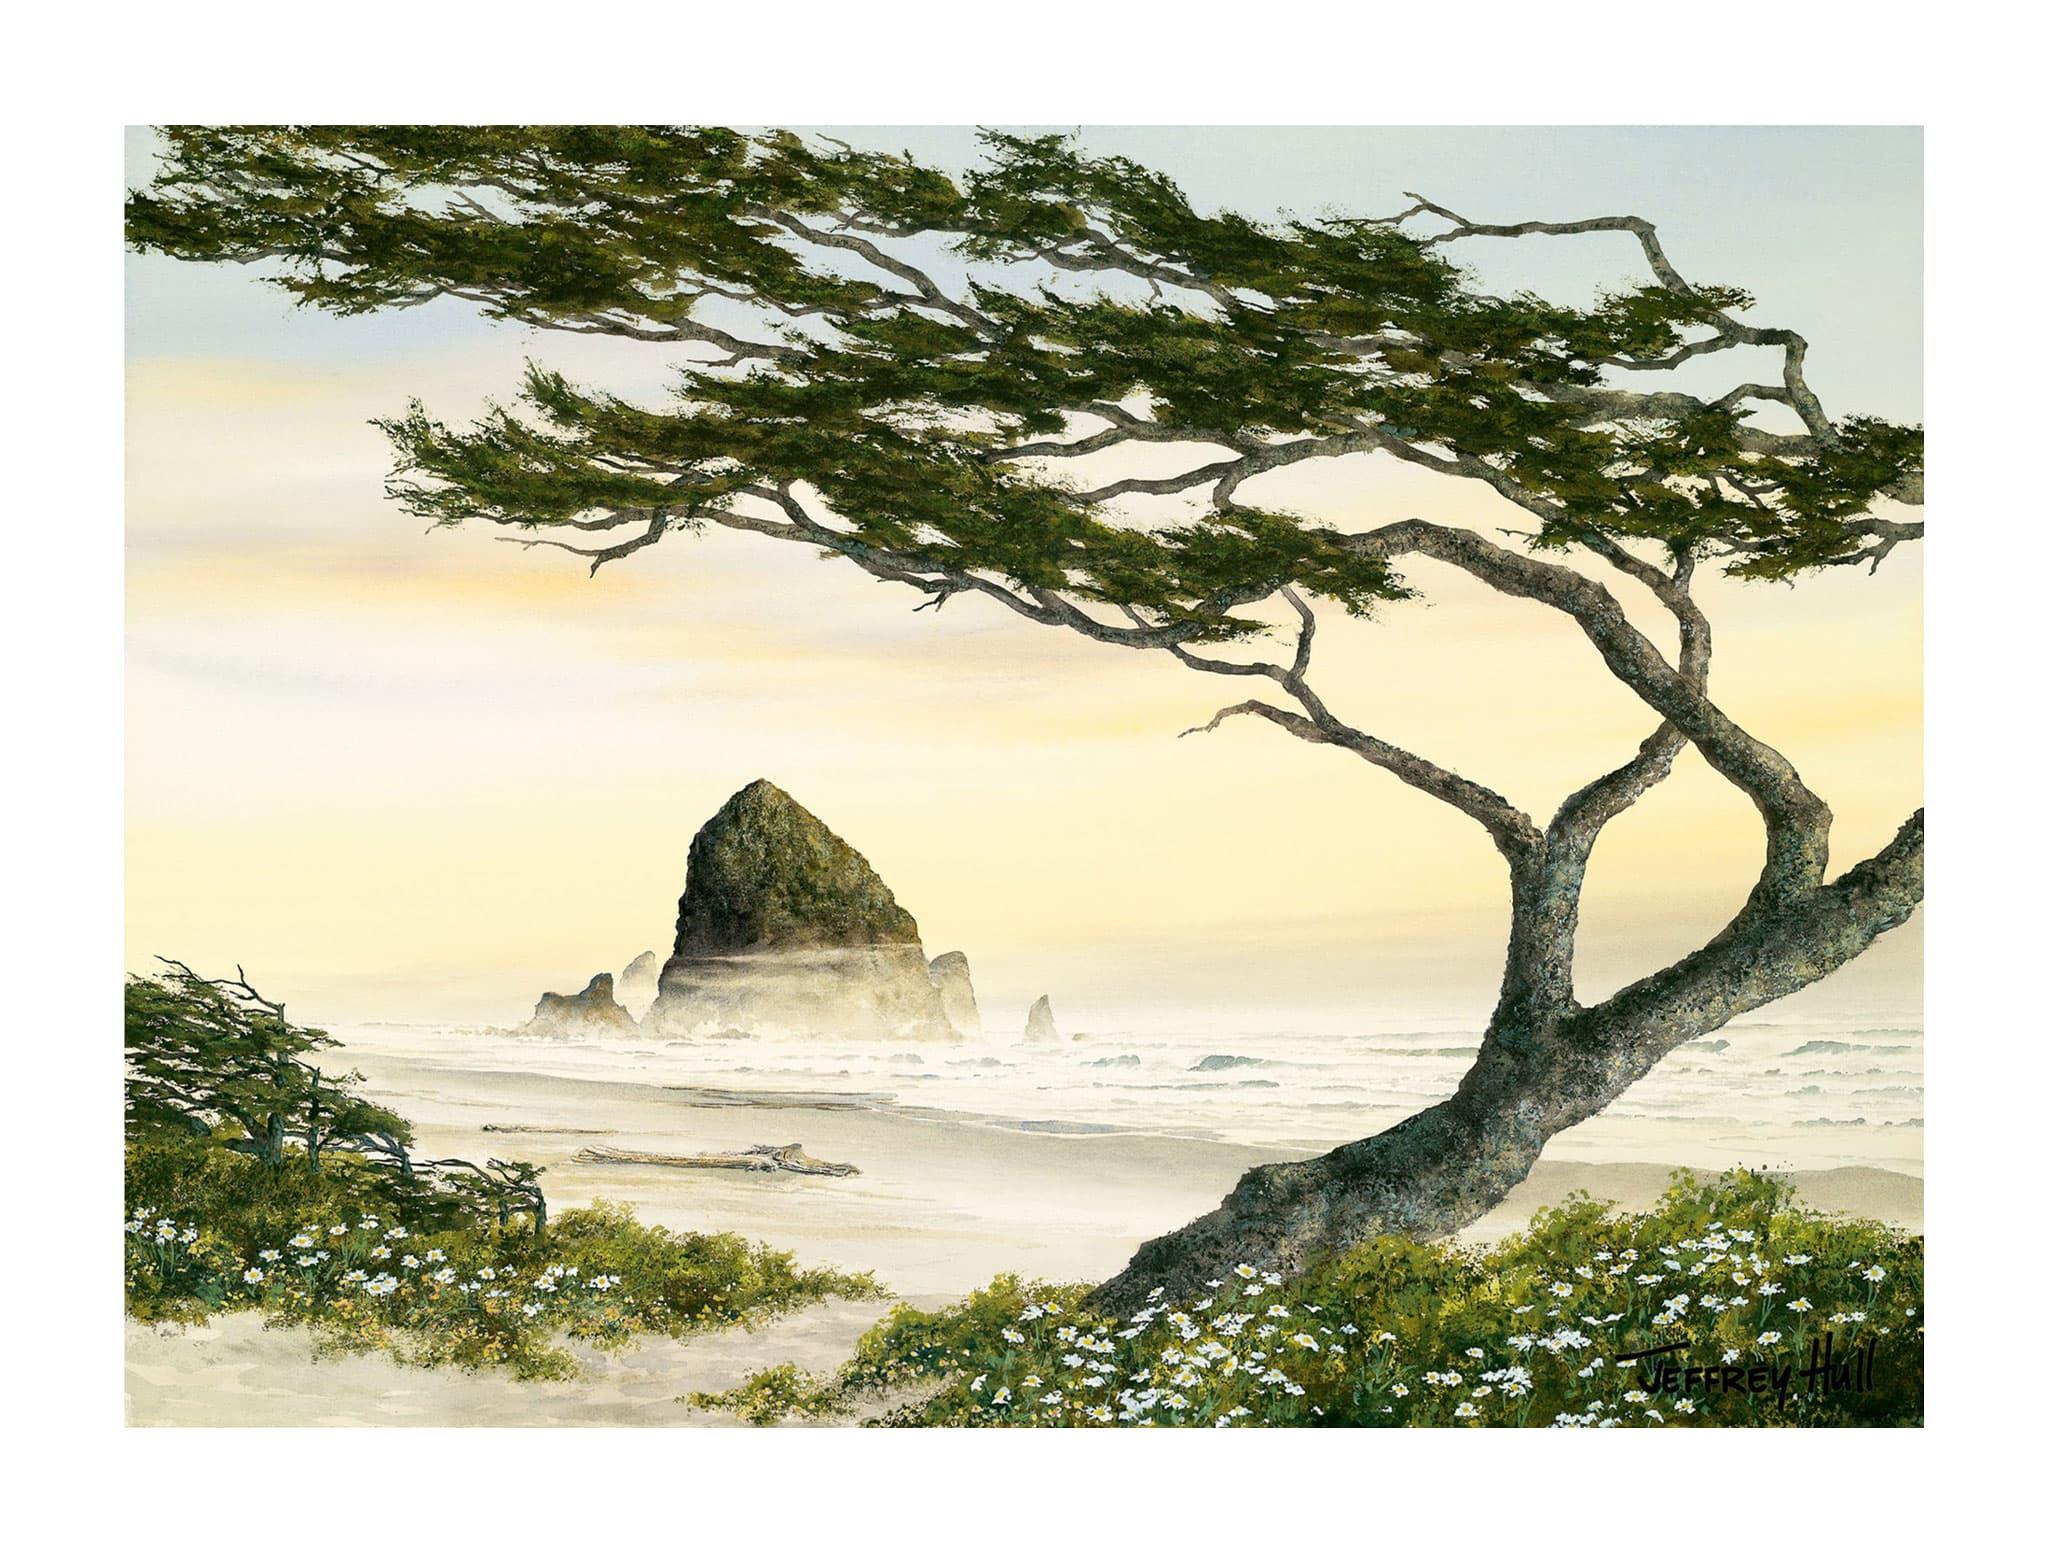 The-Wedding-Tree-OpenEd-Unframed-4-Website-2021